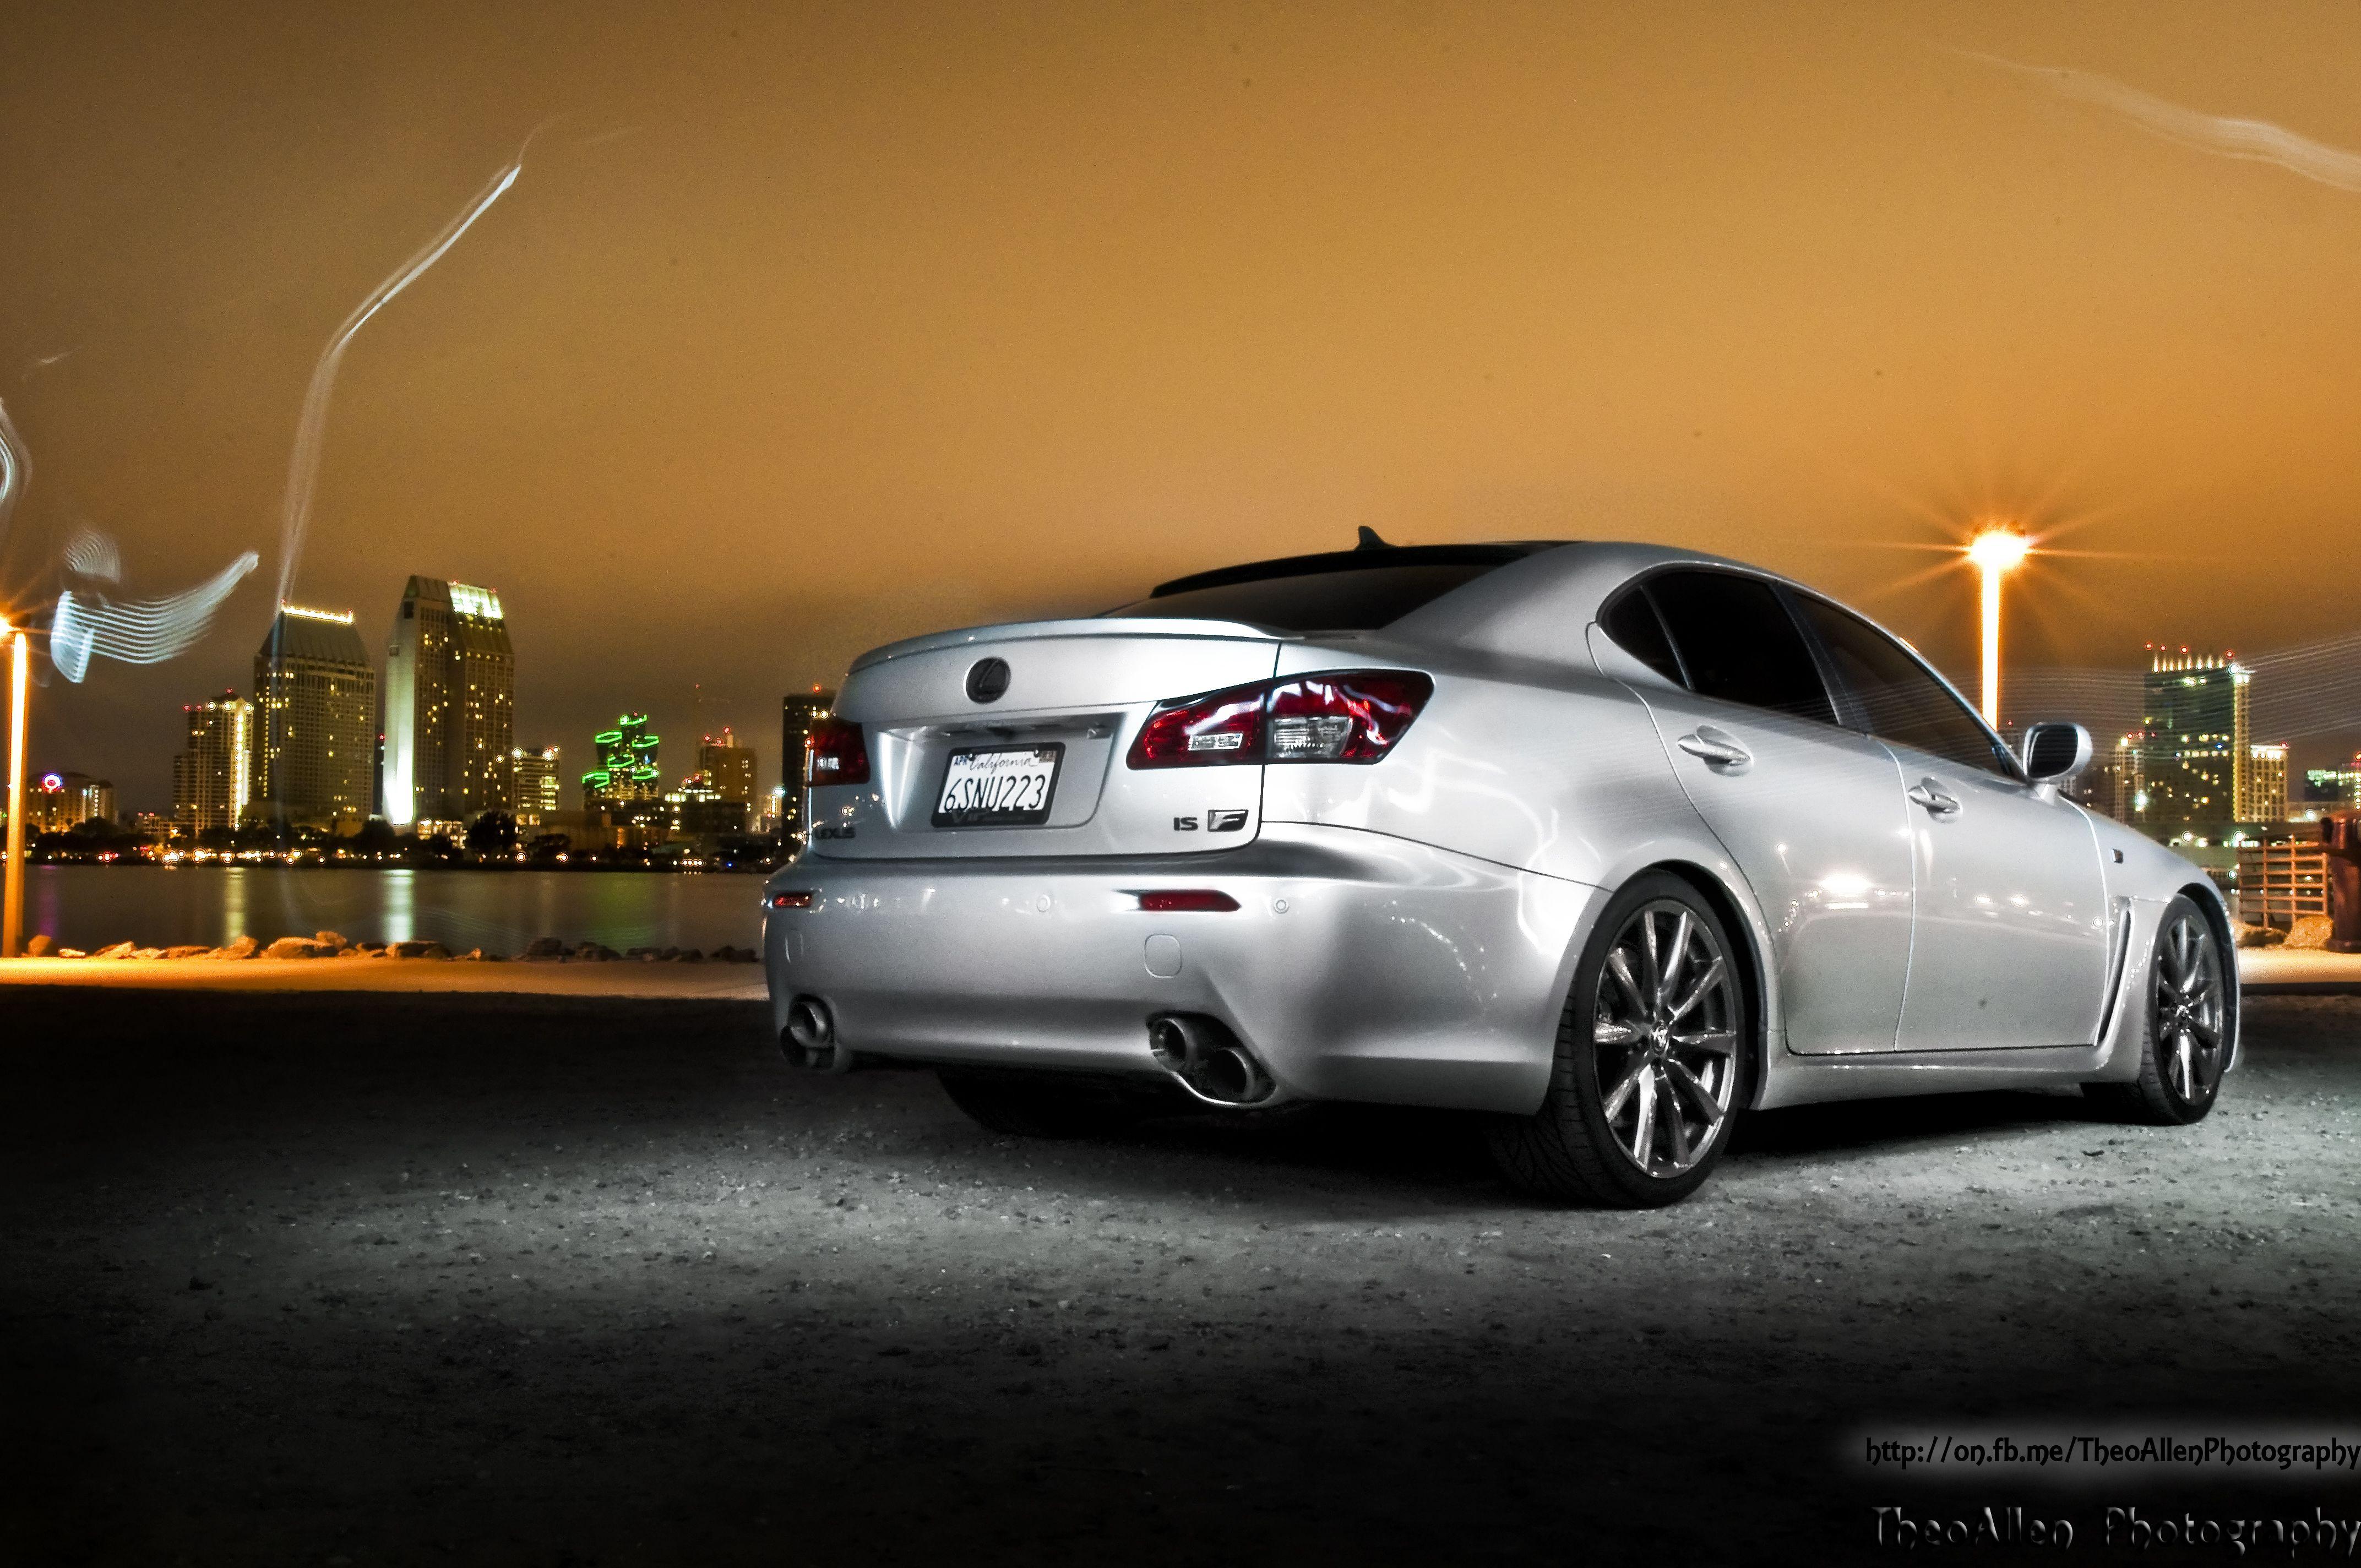 Silver Lexus Is F San Diego Ca Lexus Sport Lexus Isf Lexus